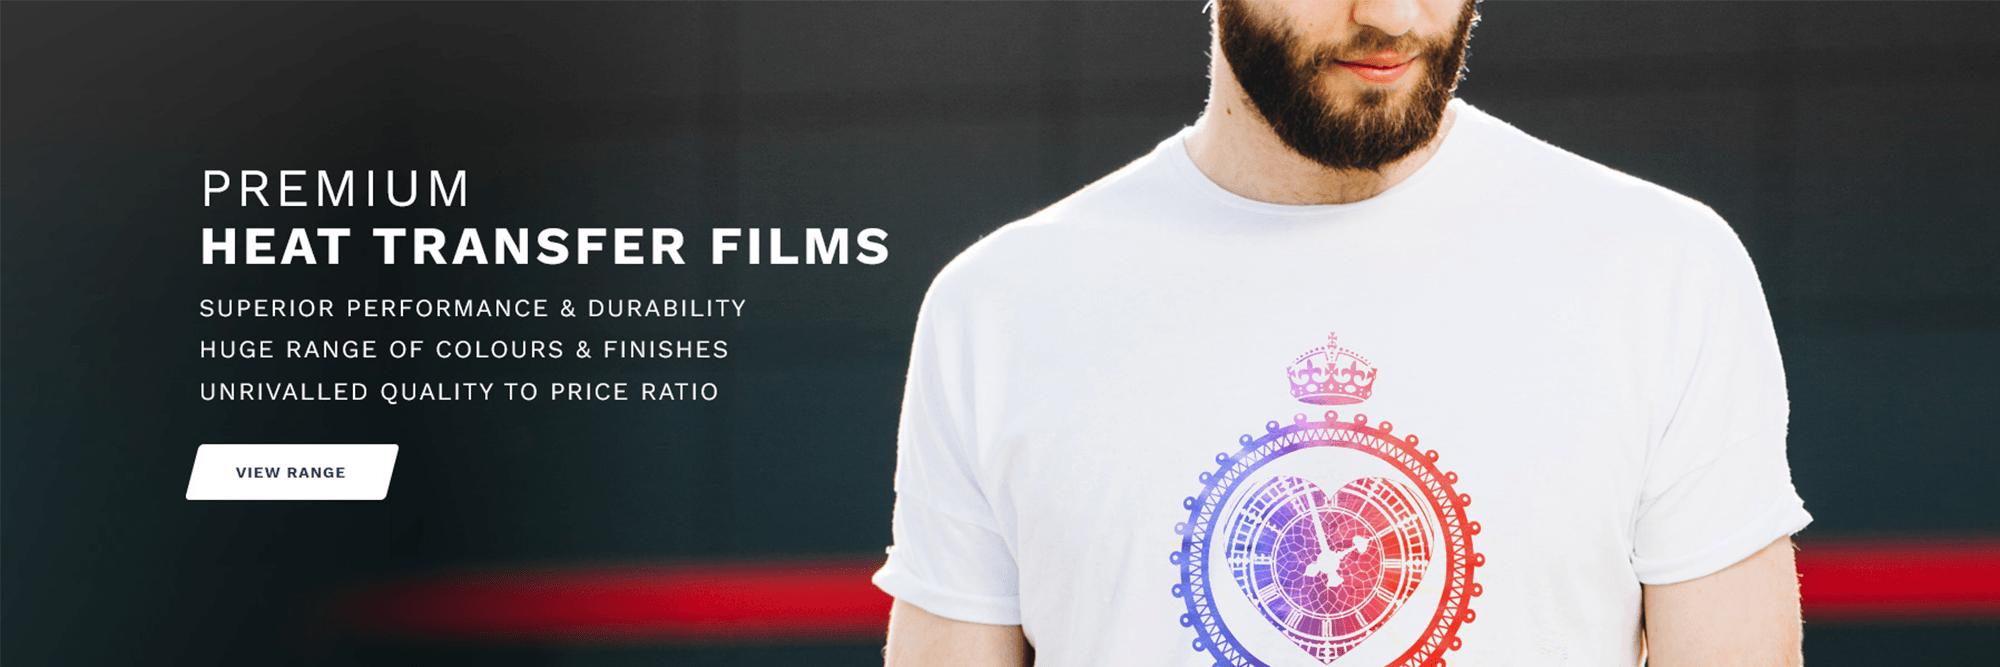 Premium Heat Transfer Films